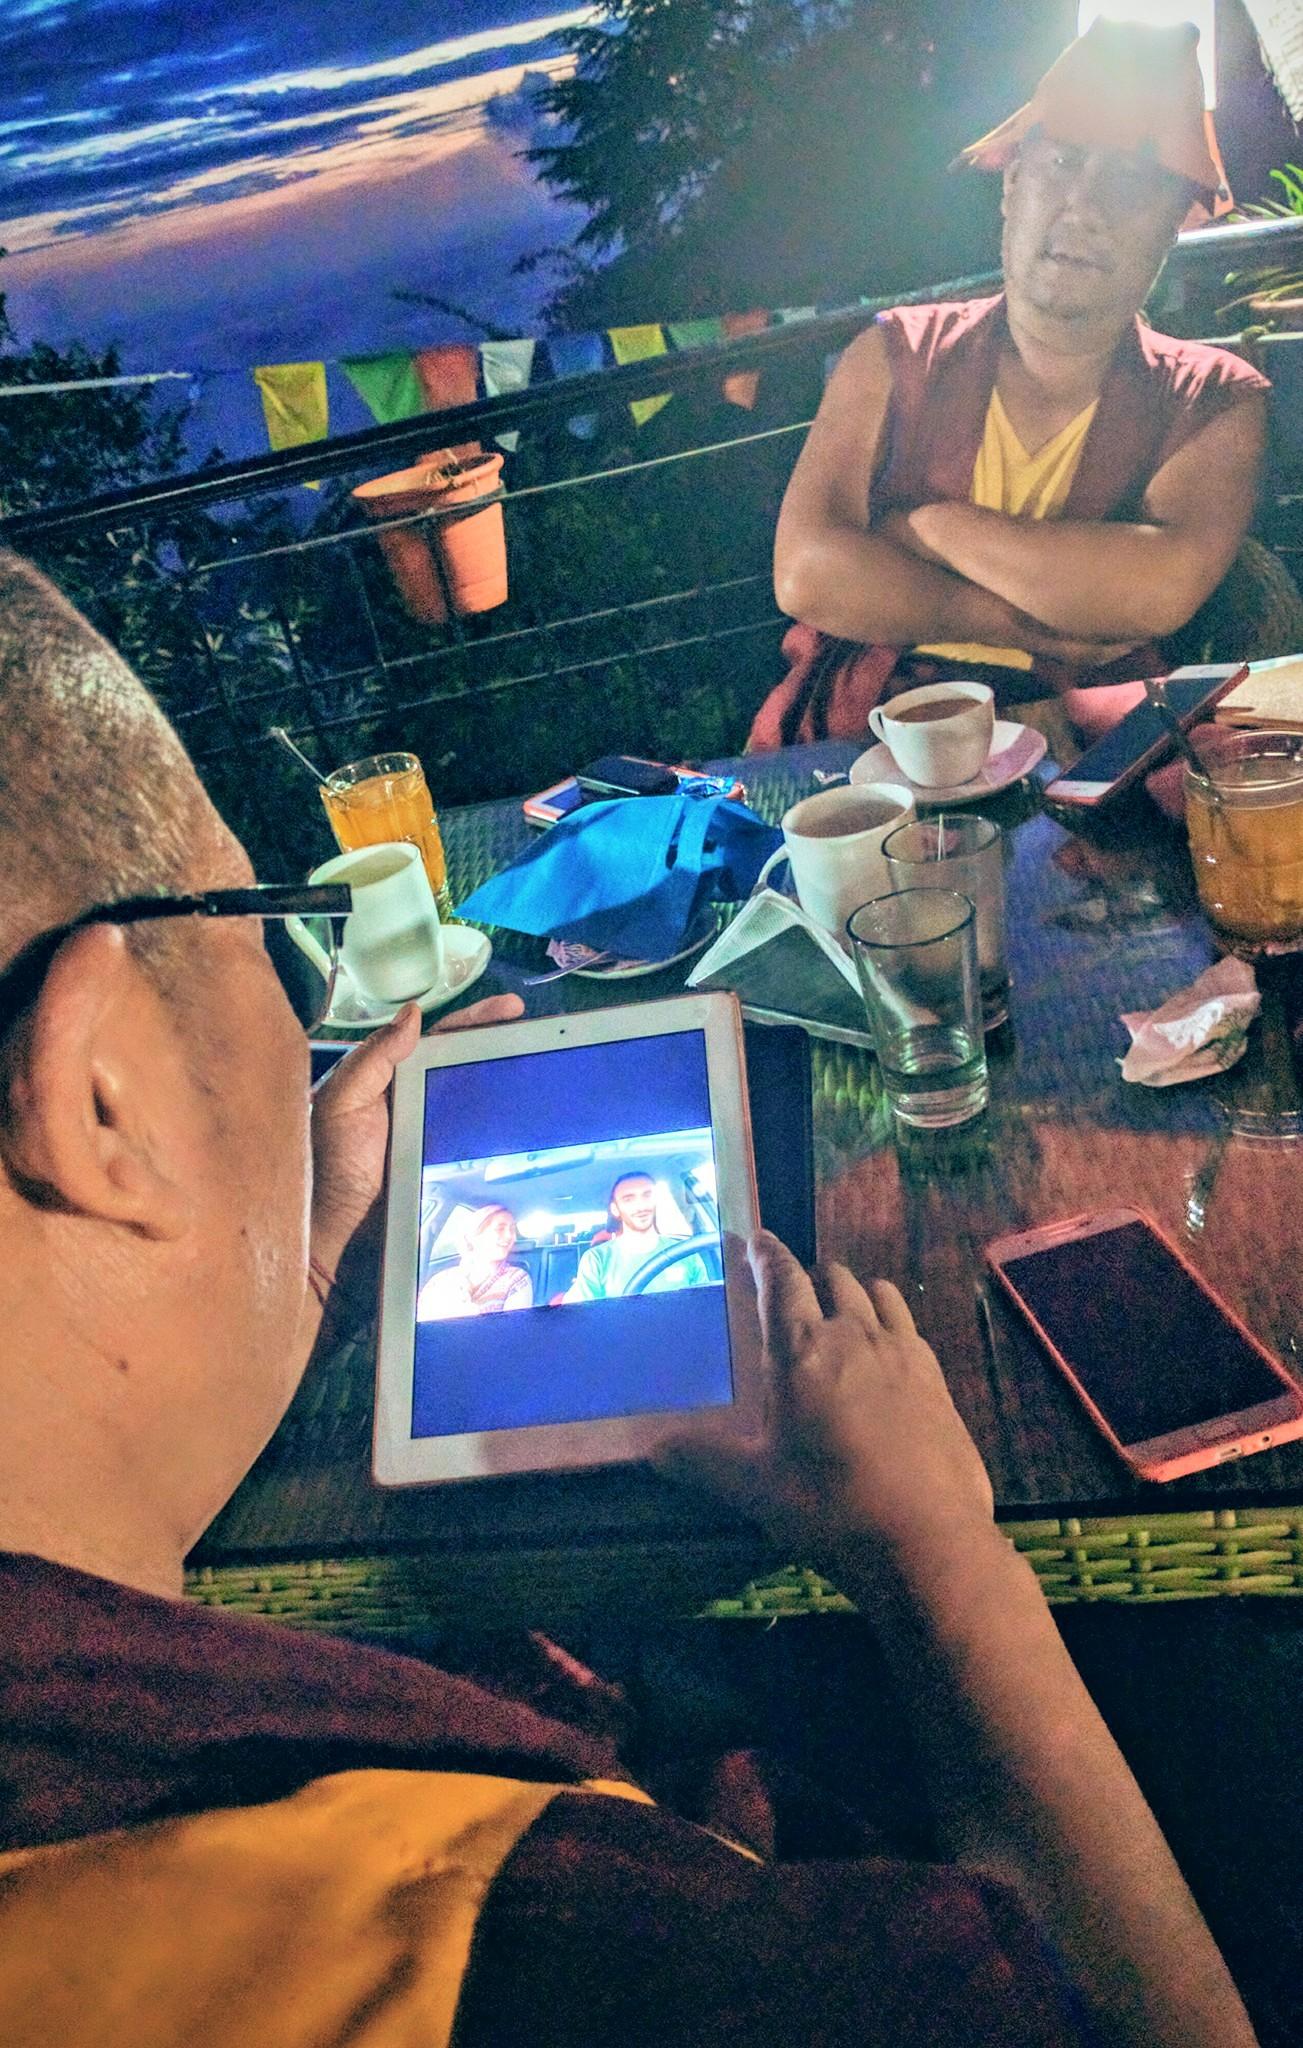 Tibetan monks enjoying a Yonina music video. Photo via Facebook